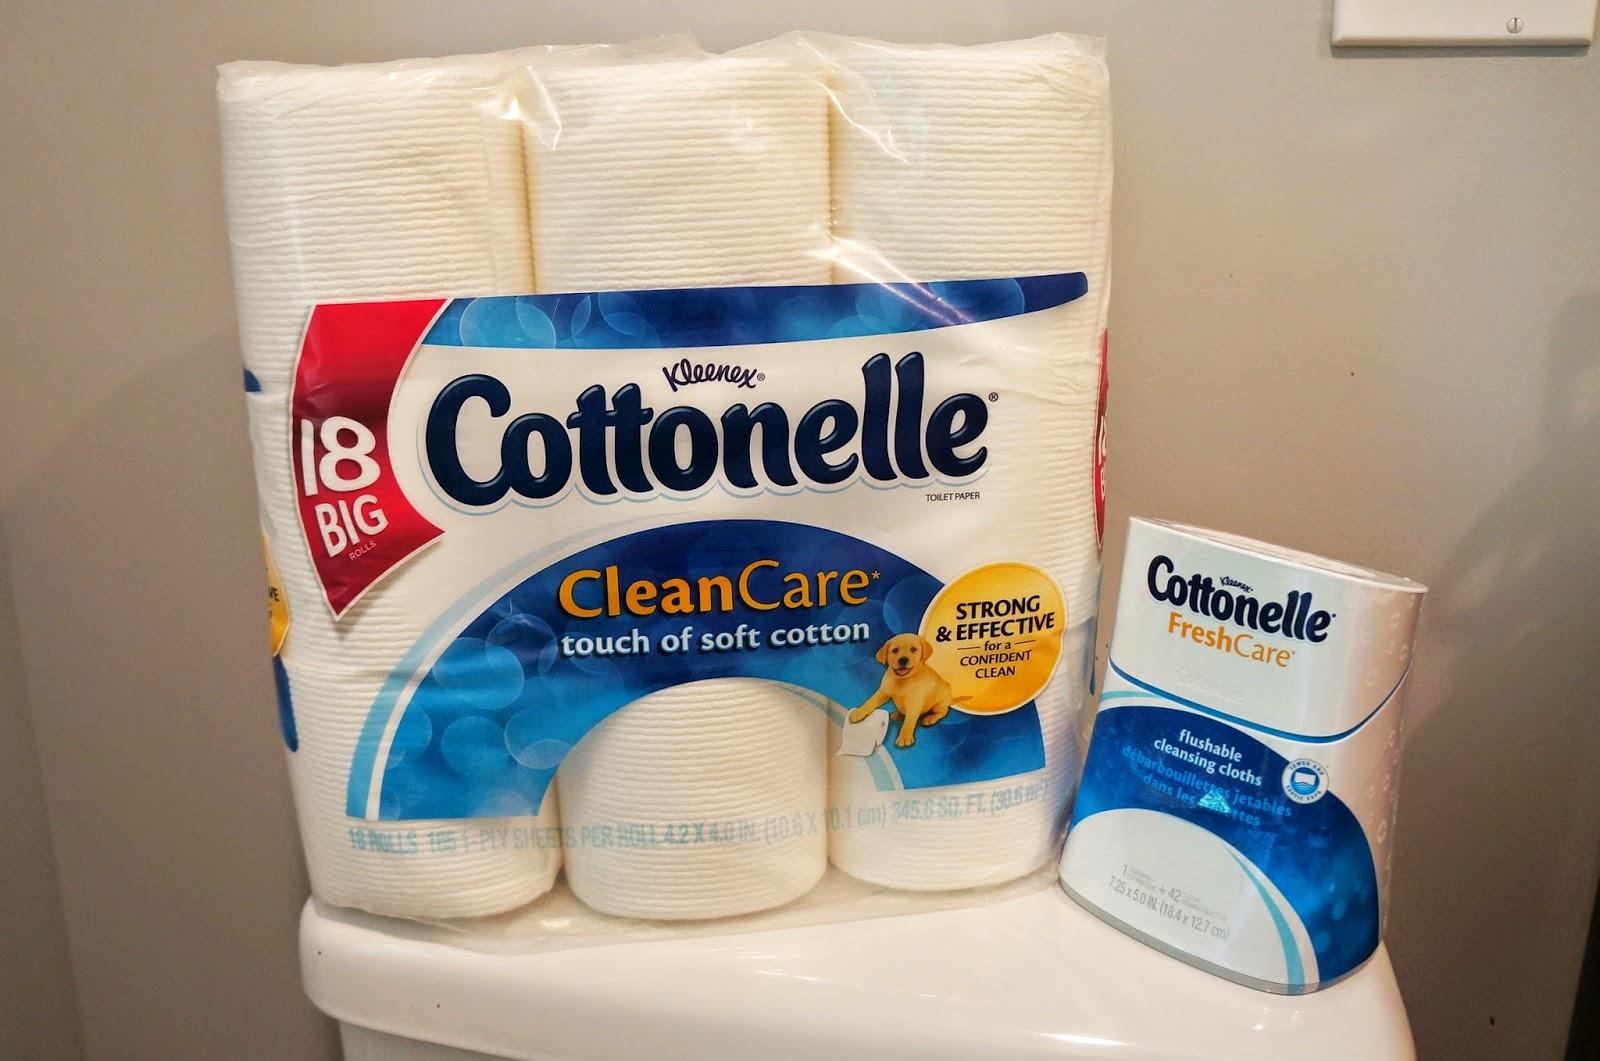 Cottonelle® Clean Care TP and Flushable Cleansing Cloths